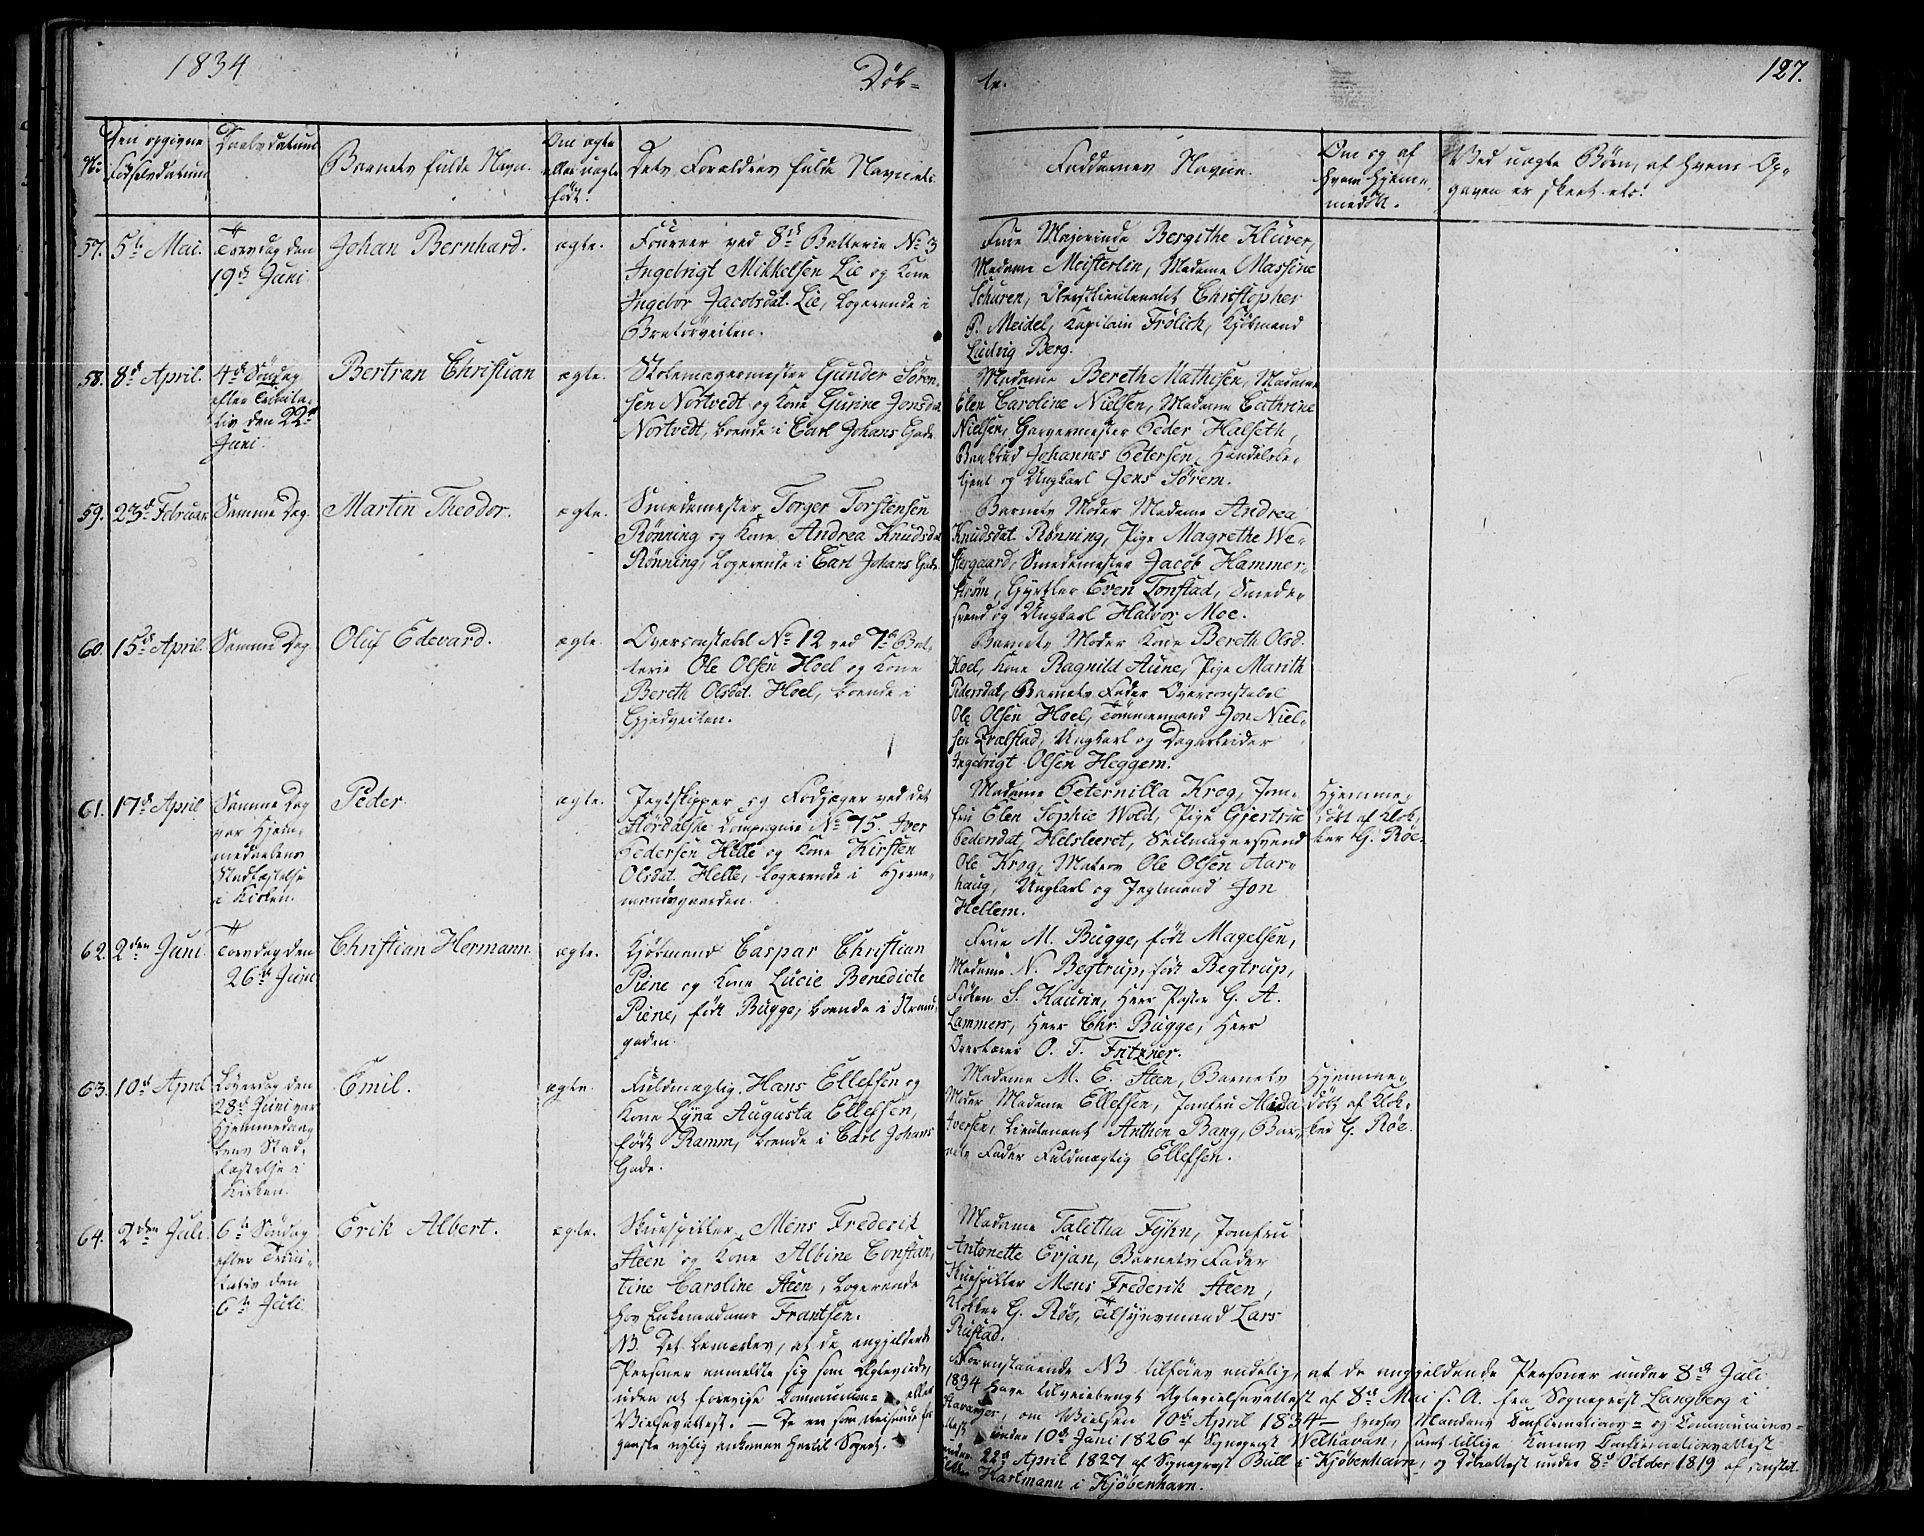 SAT, Ministerialprotokoller, klokkerbøker og fødselsregistre - Sør-Trøndelag, 602/L0108: Parish register (official) no. 602A06, 1821-1839, p. 127